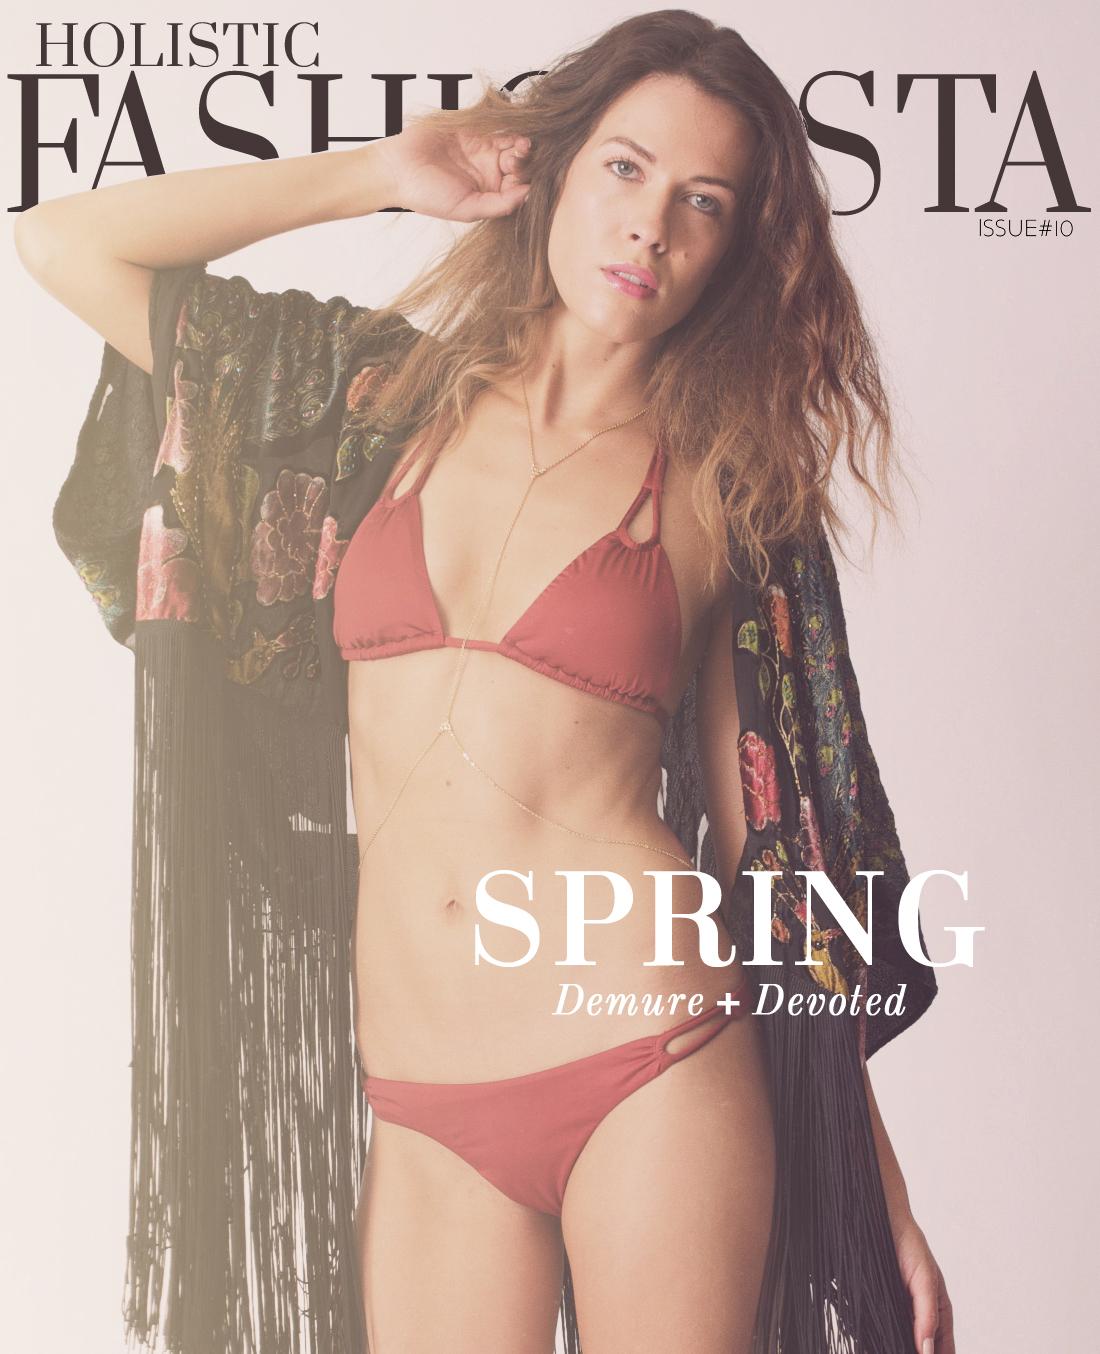 Holistic Fashionista Magazine Issue#10